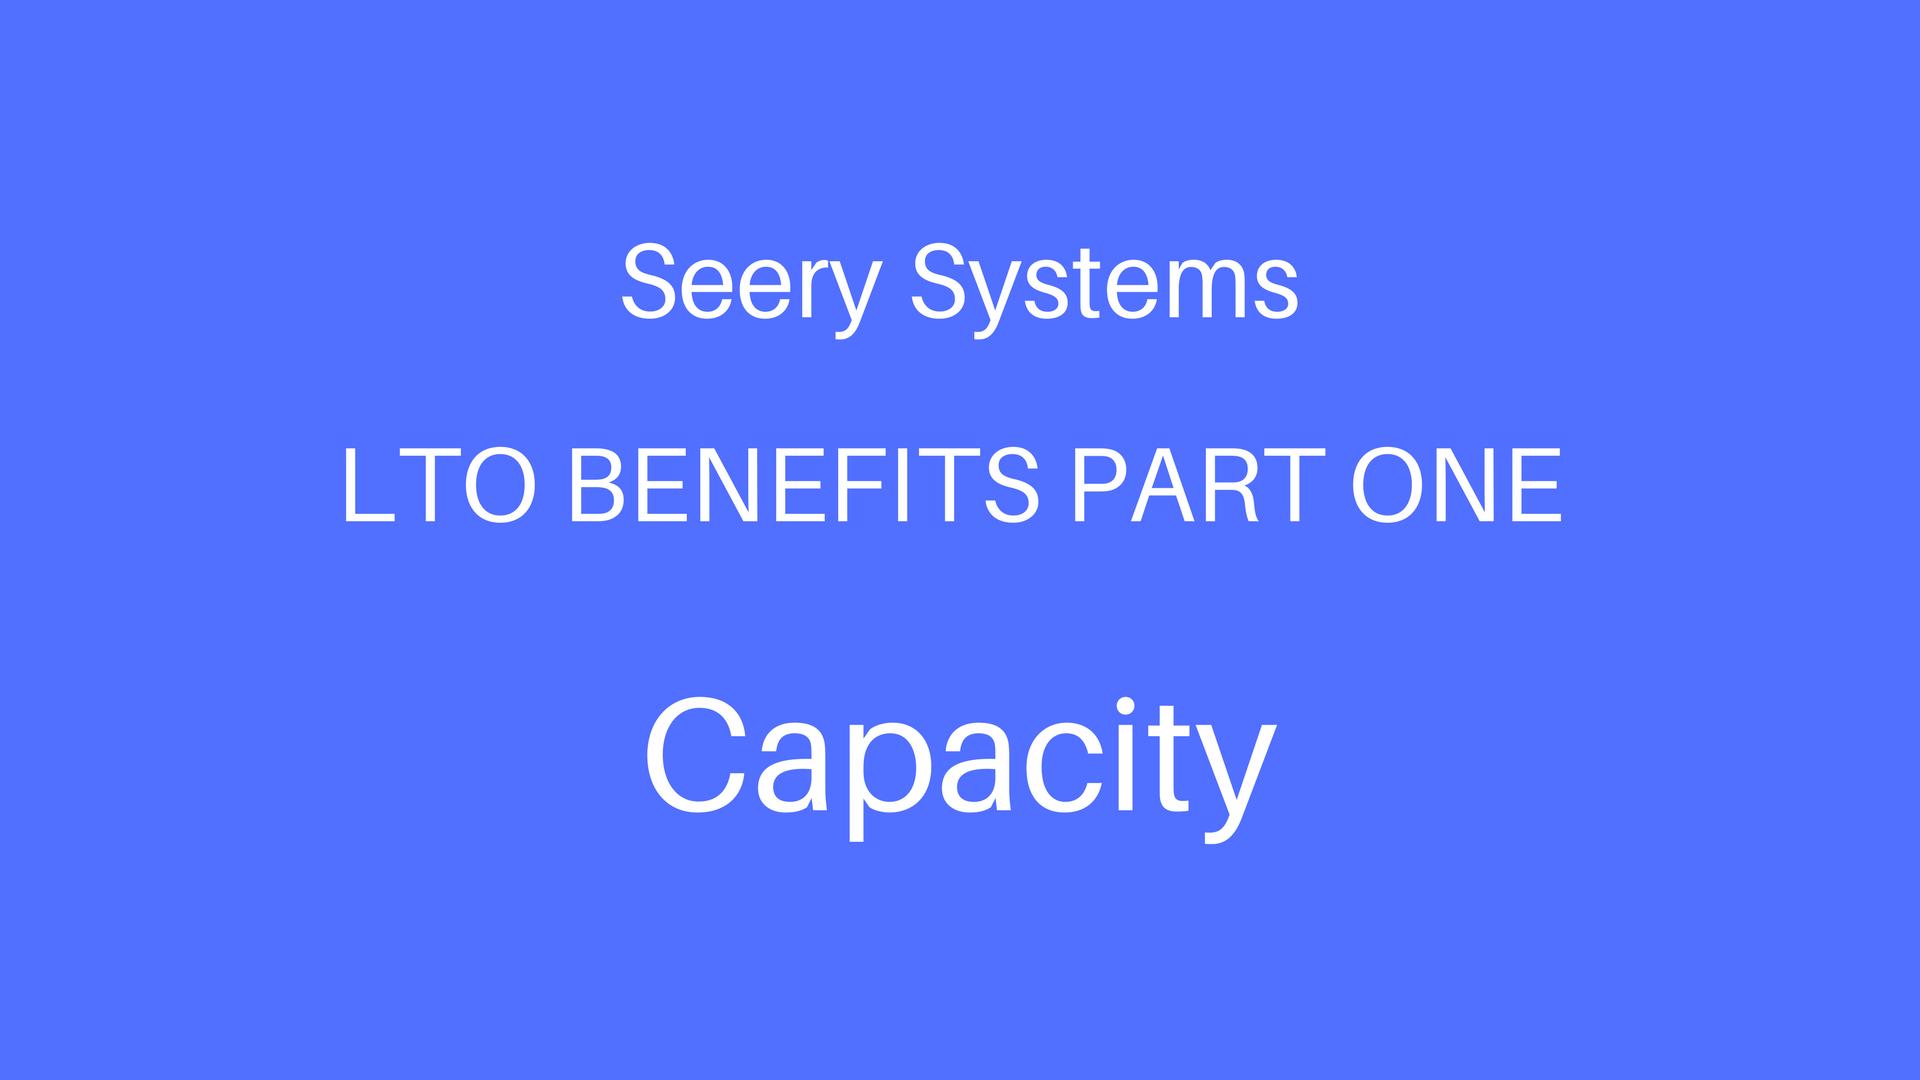 LTO Benefits Part 1 - Capacity